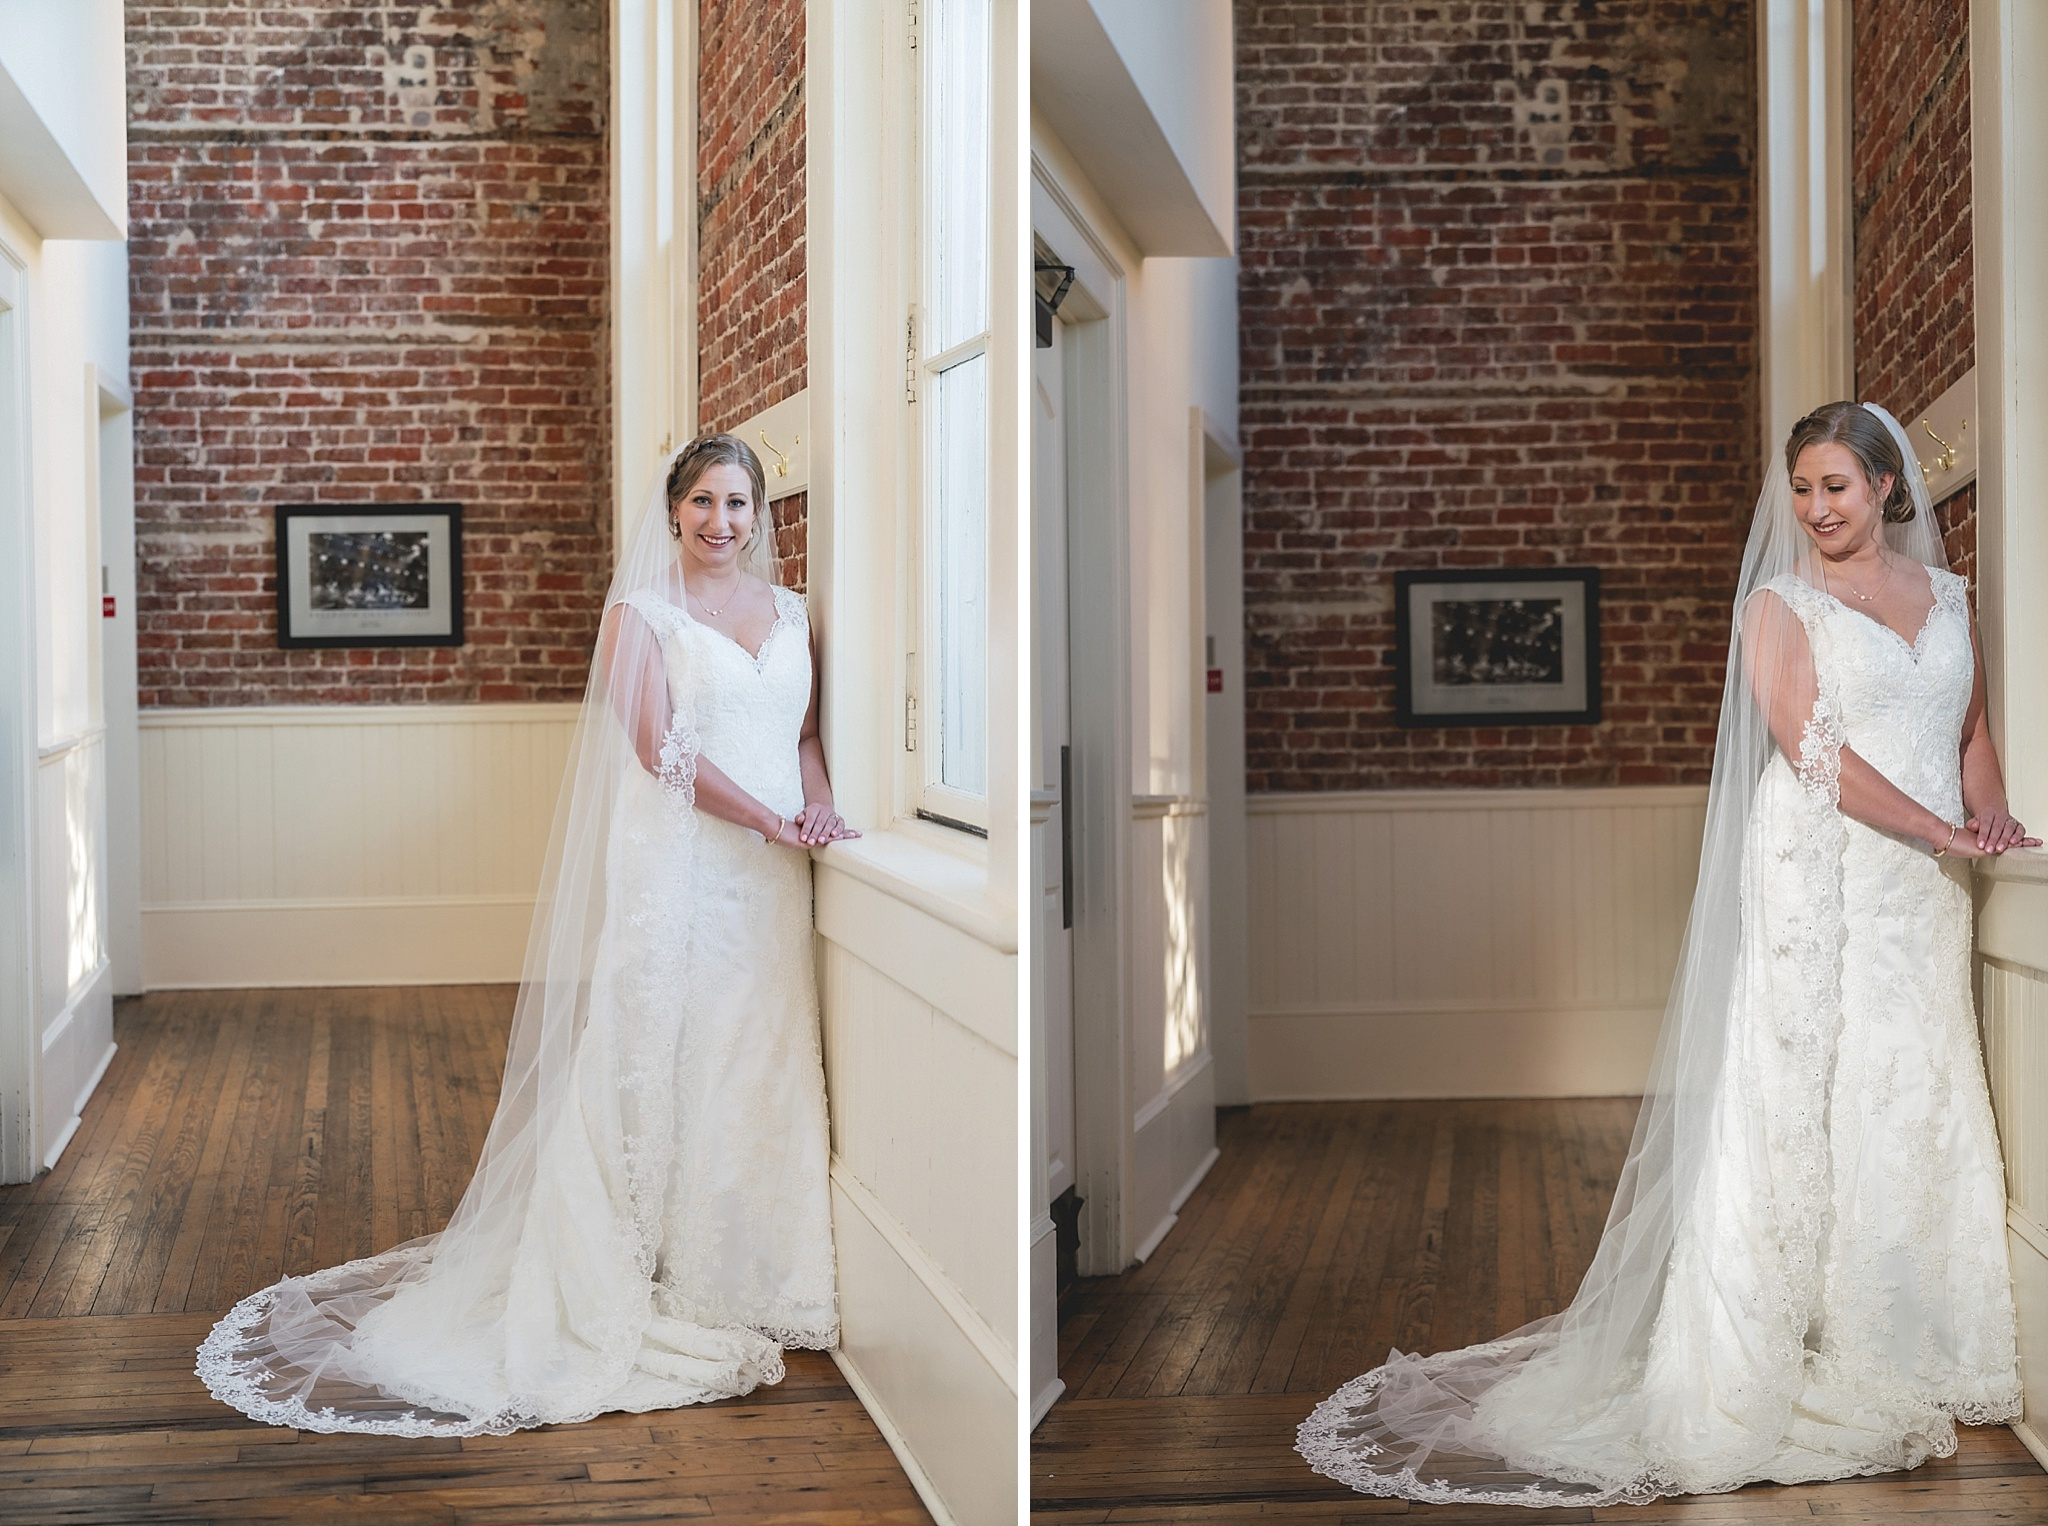 New-Bern-NC-Wedding-Photographer-053.jpg